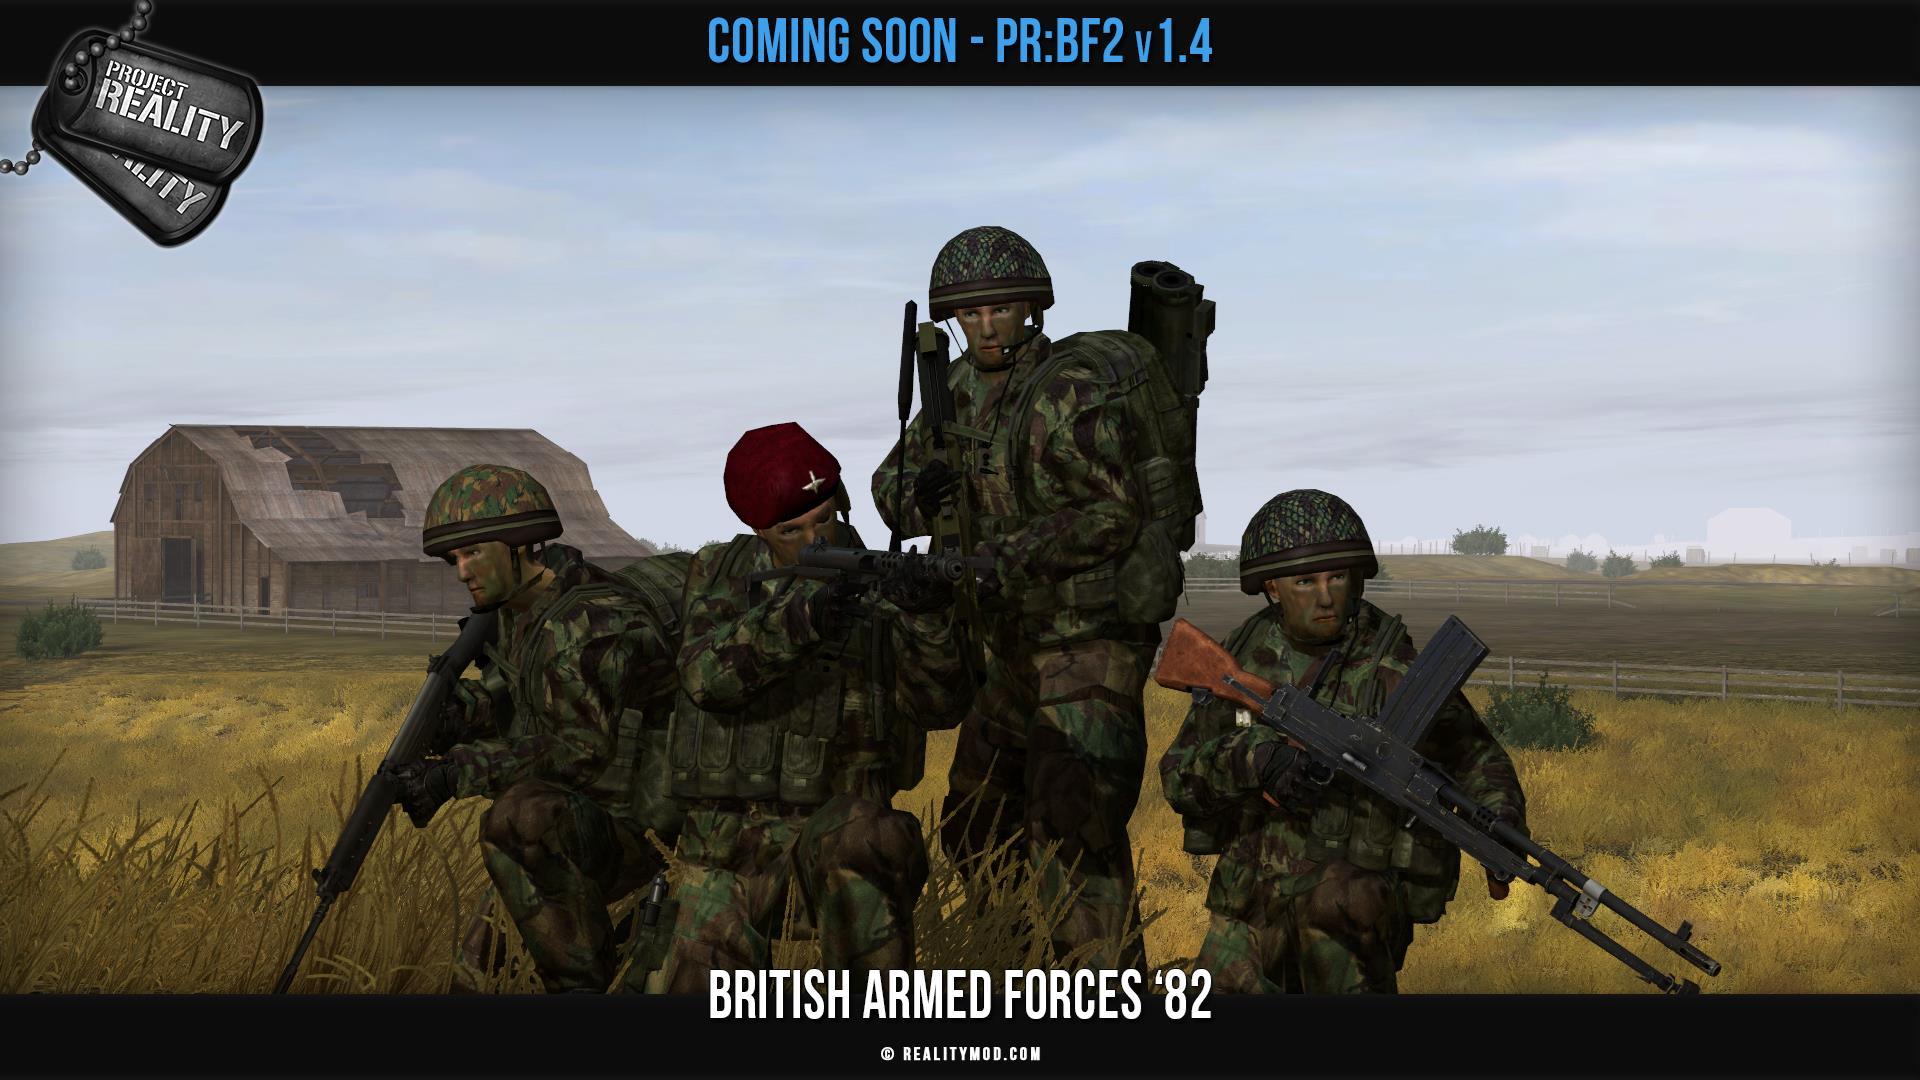 Battlefield 2 Mod Project Reality Adds The Falklands War